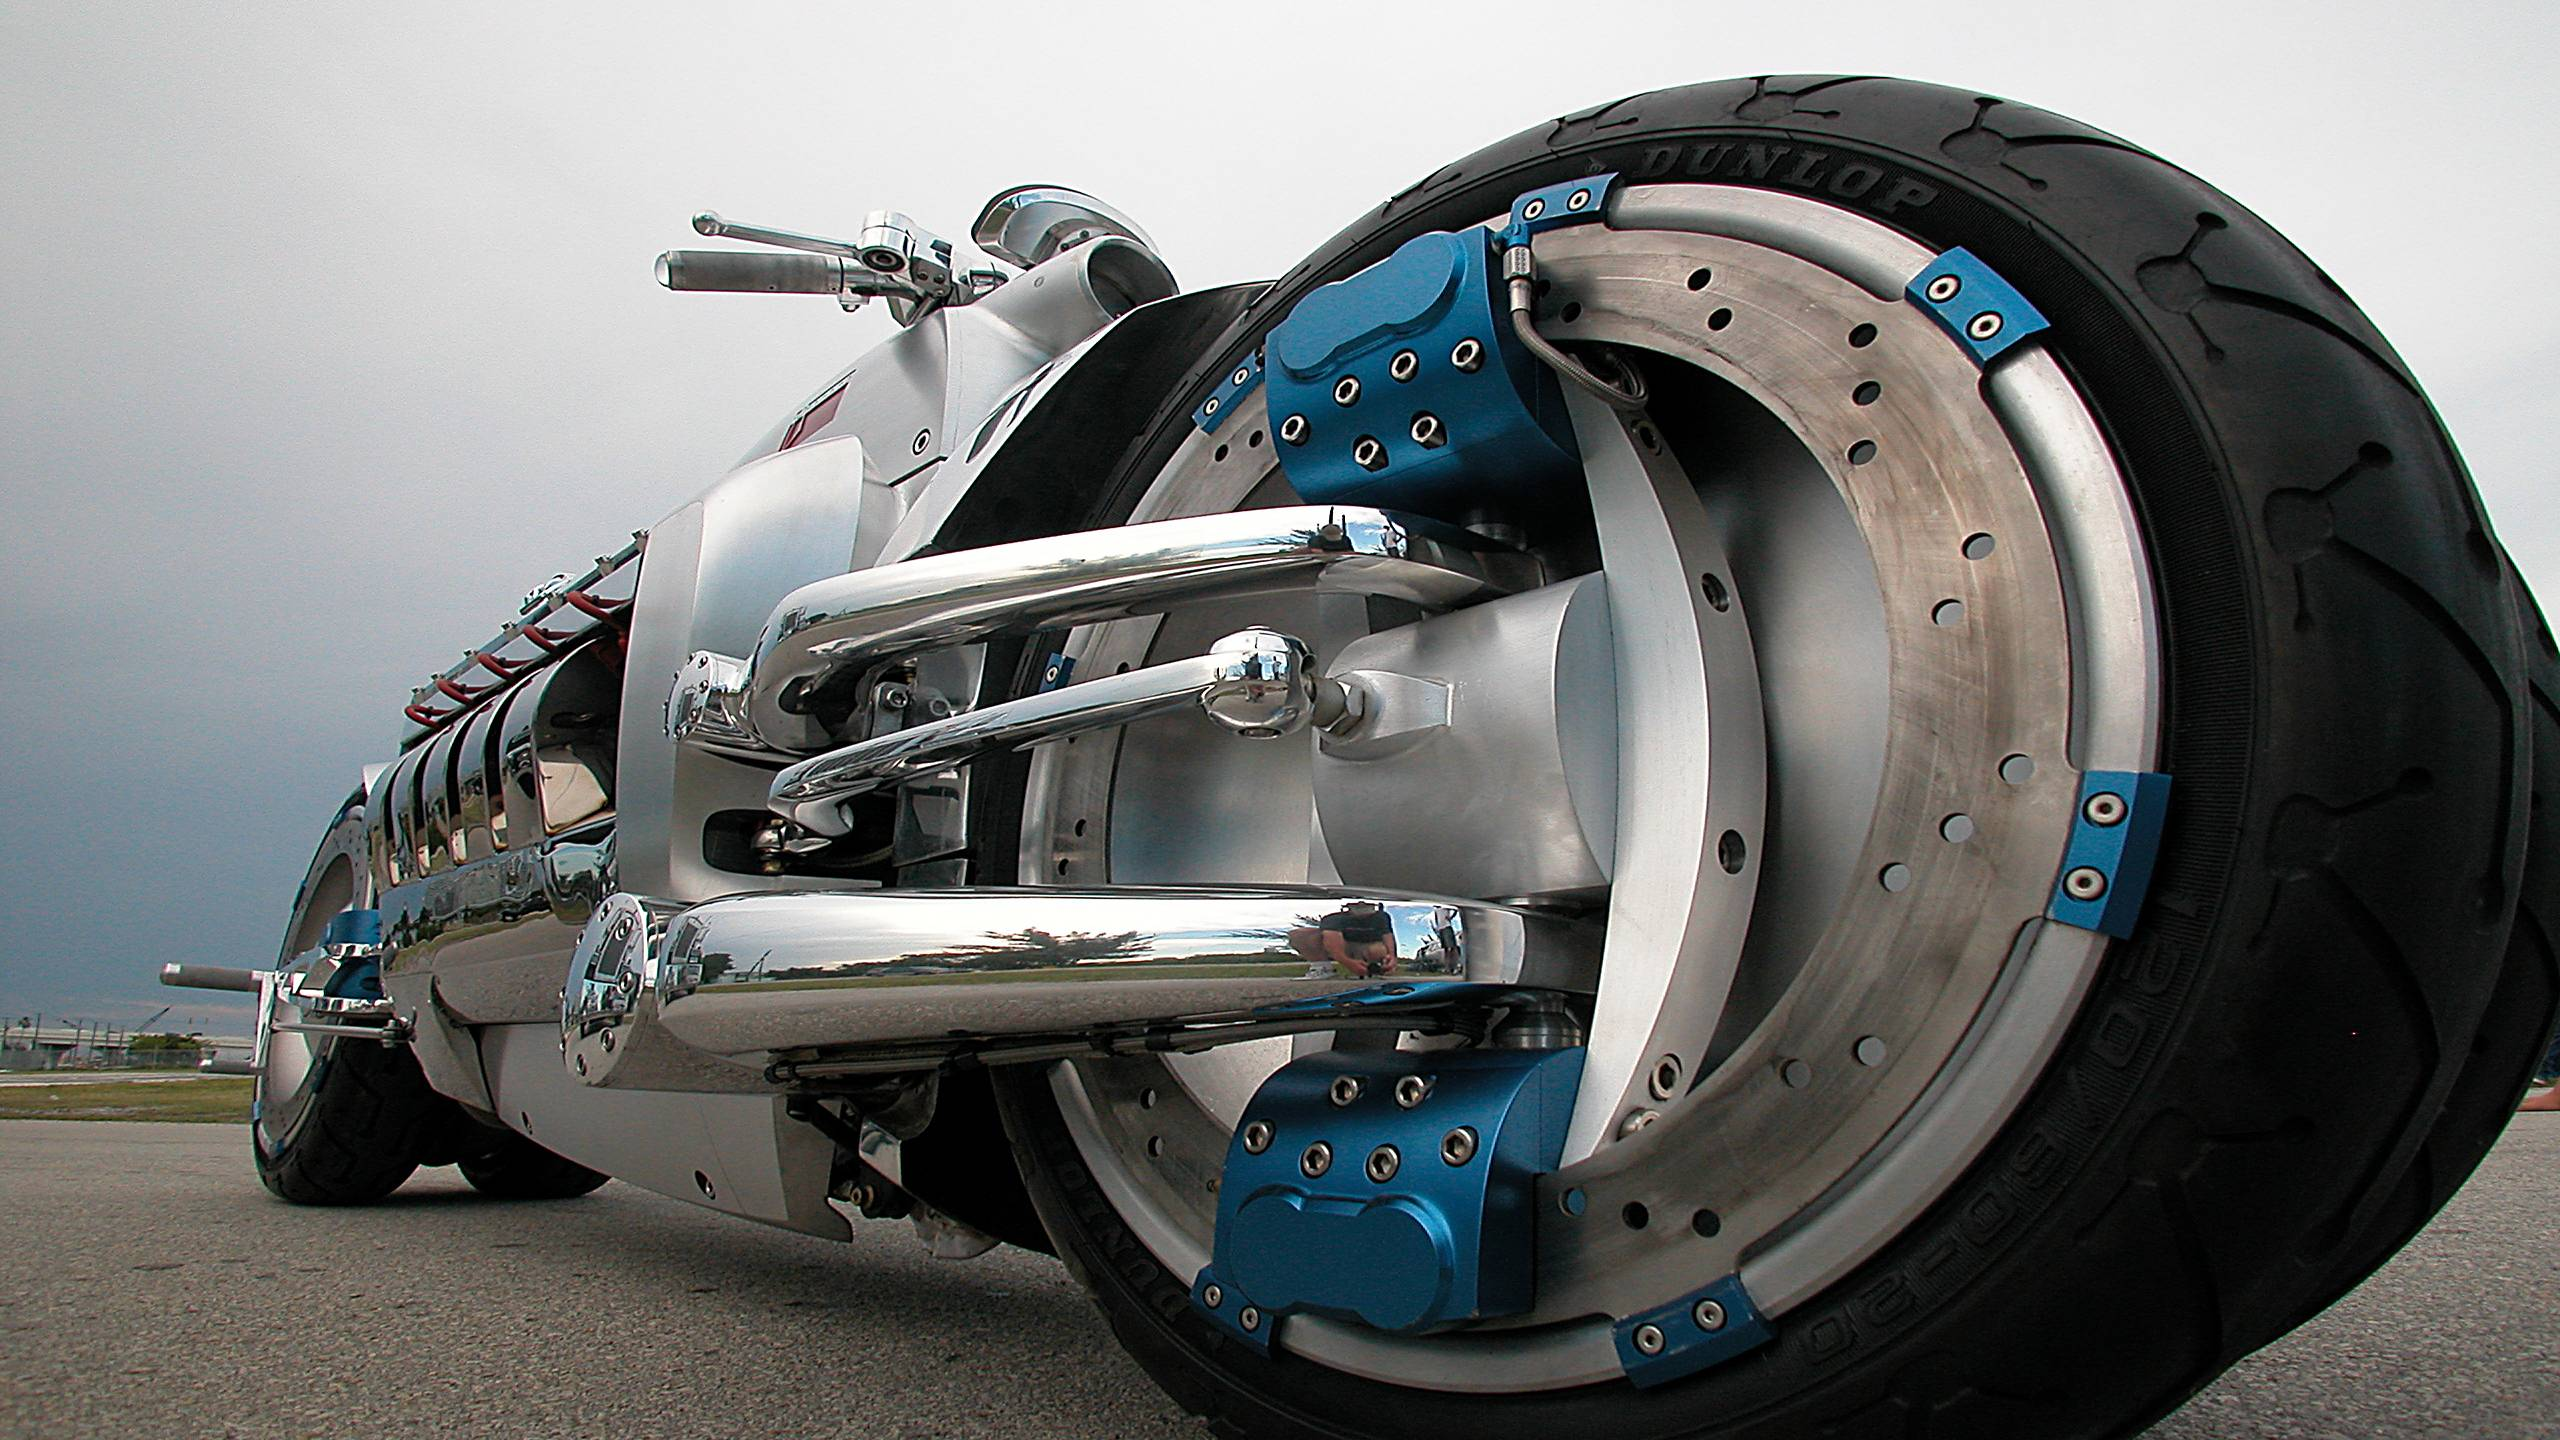 обои мотоцикл, концепт, колеса, диски картинки фото